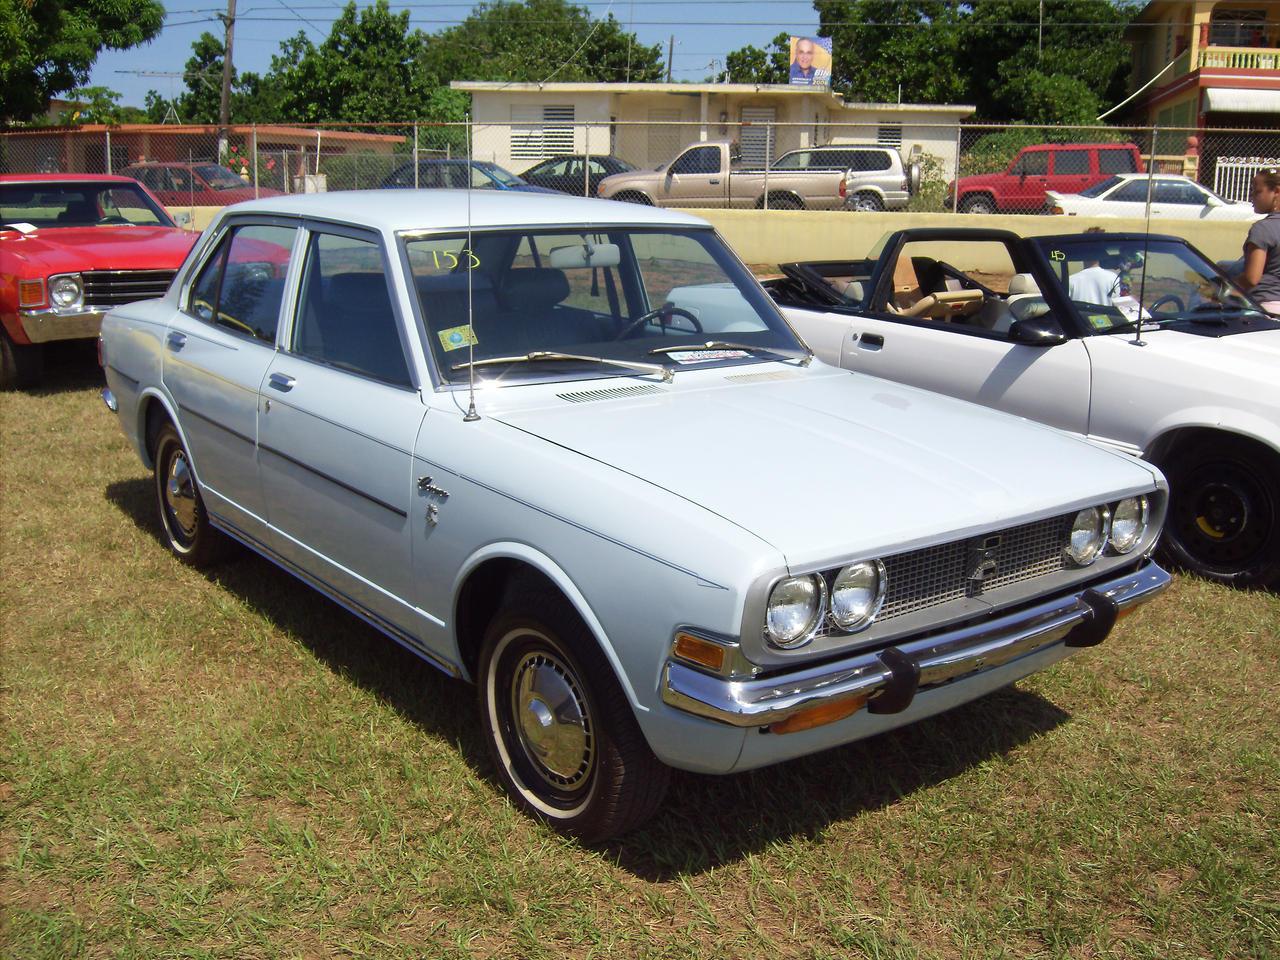 1970 Toyota Corona Sedan By Mister Lou On Deviantart